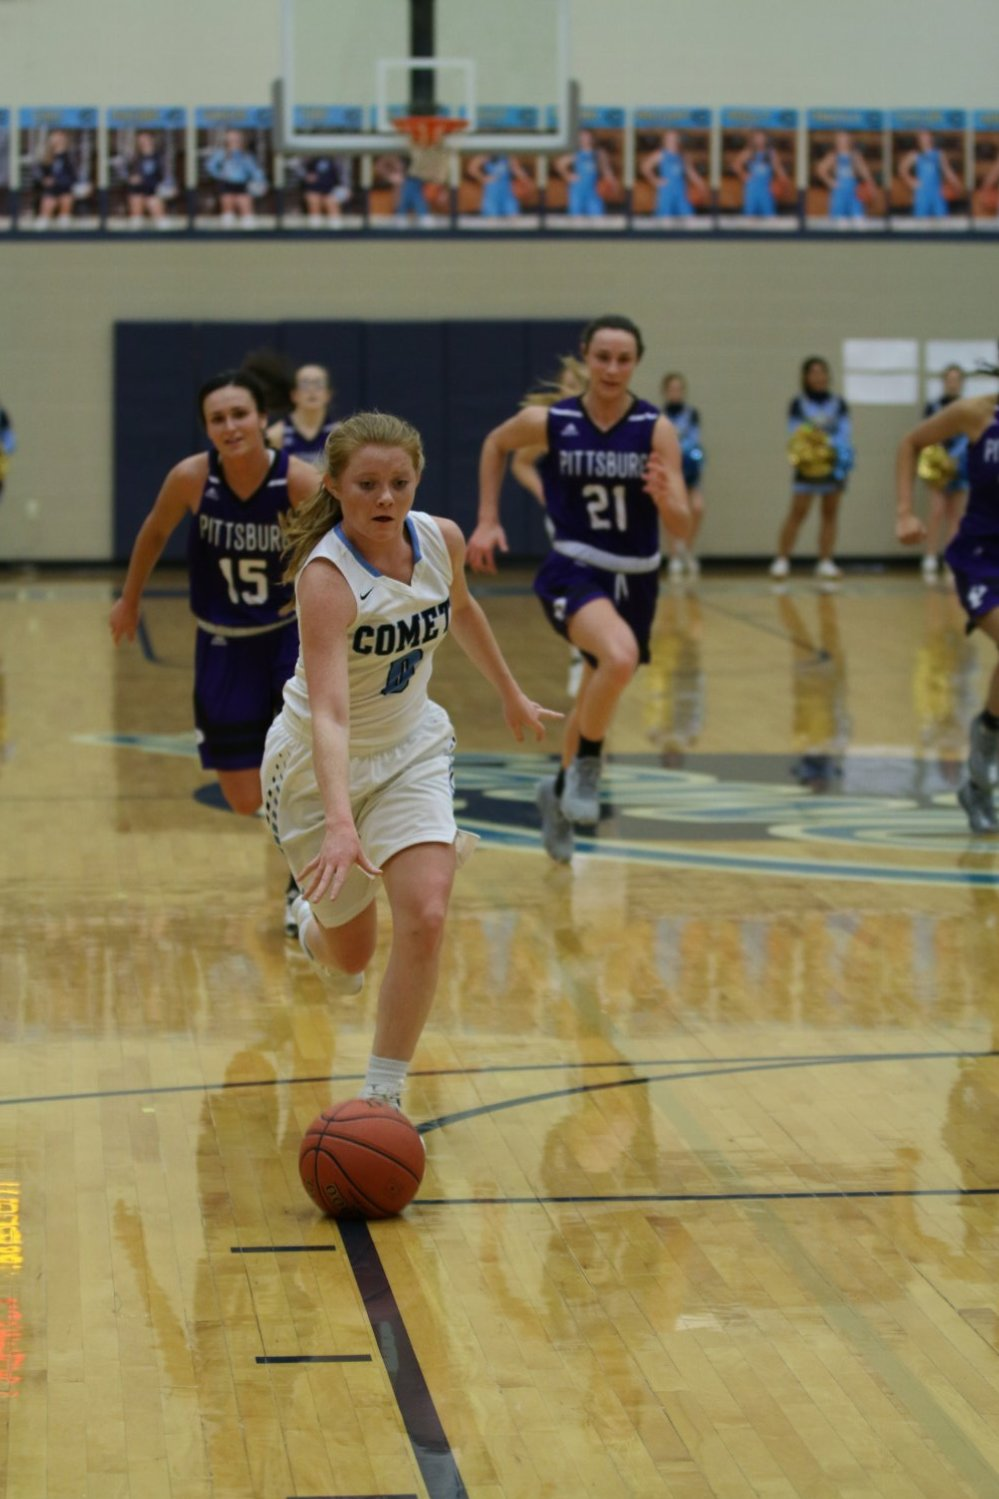 Girls Basketball vs Pittsburg